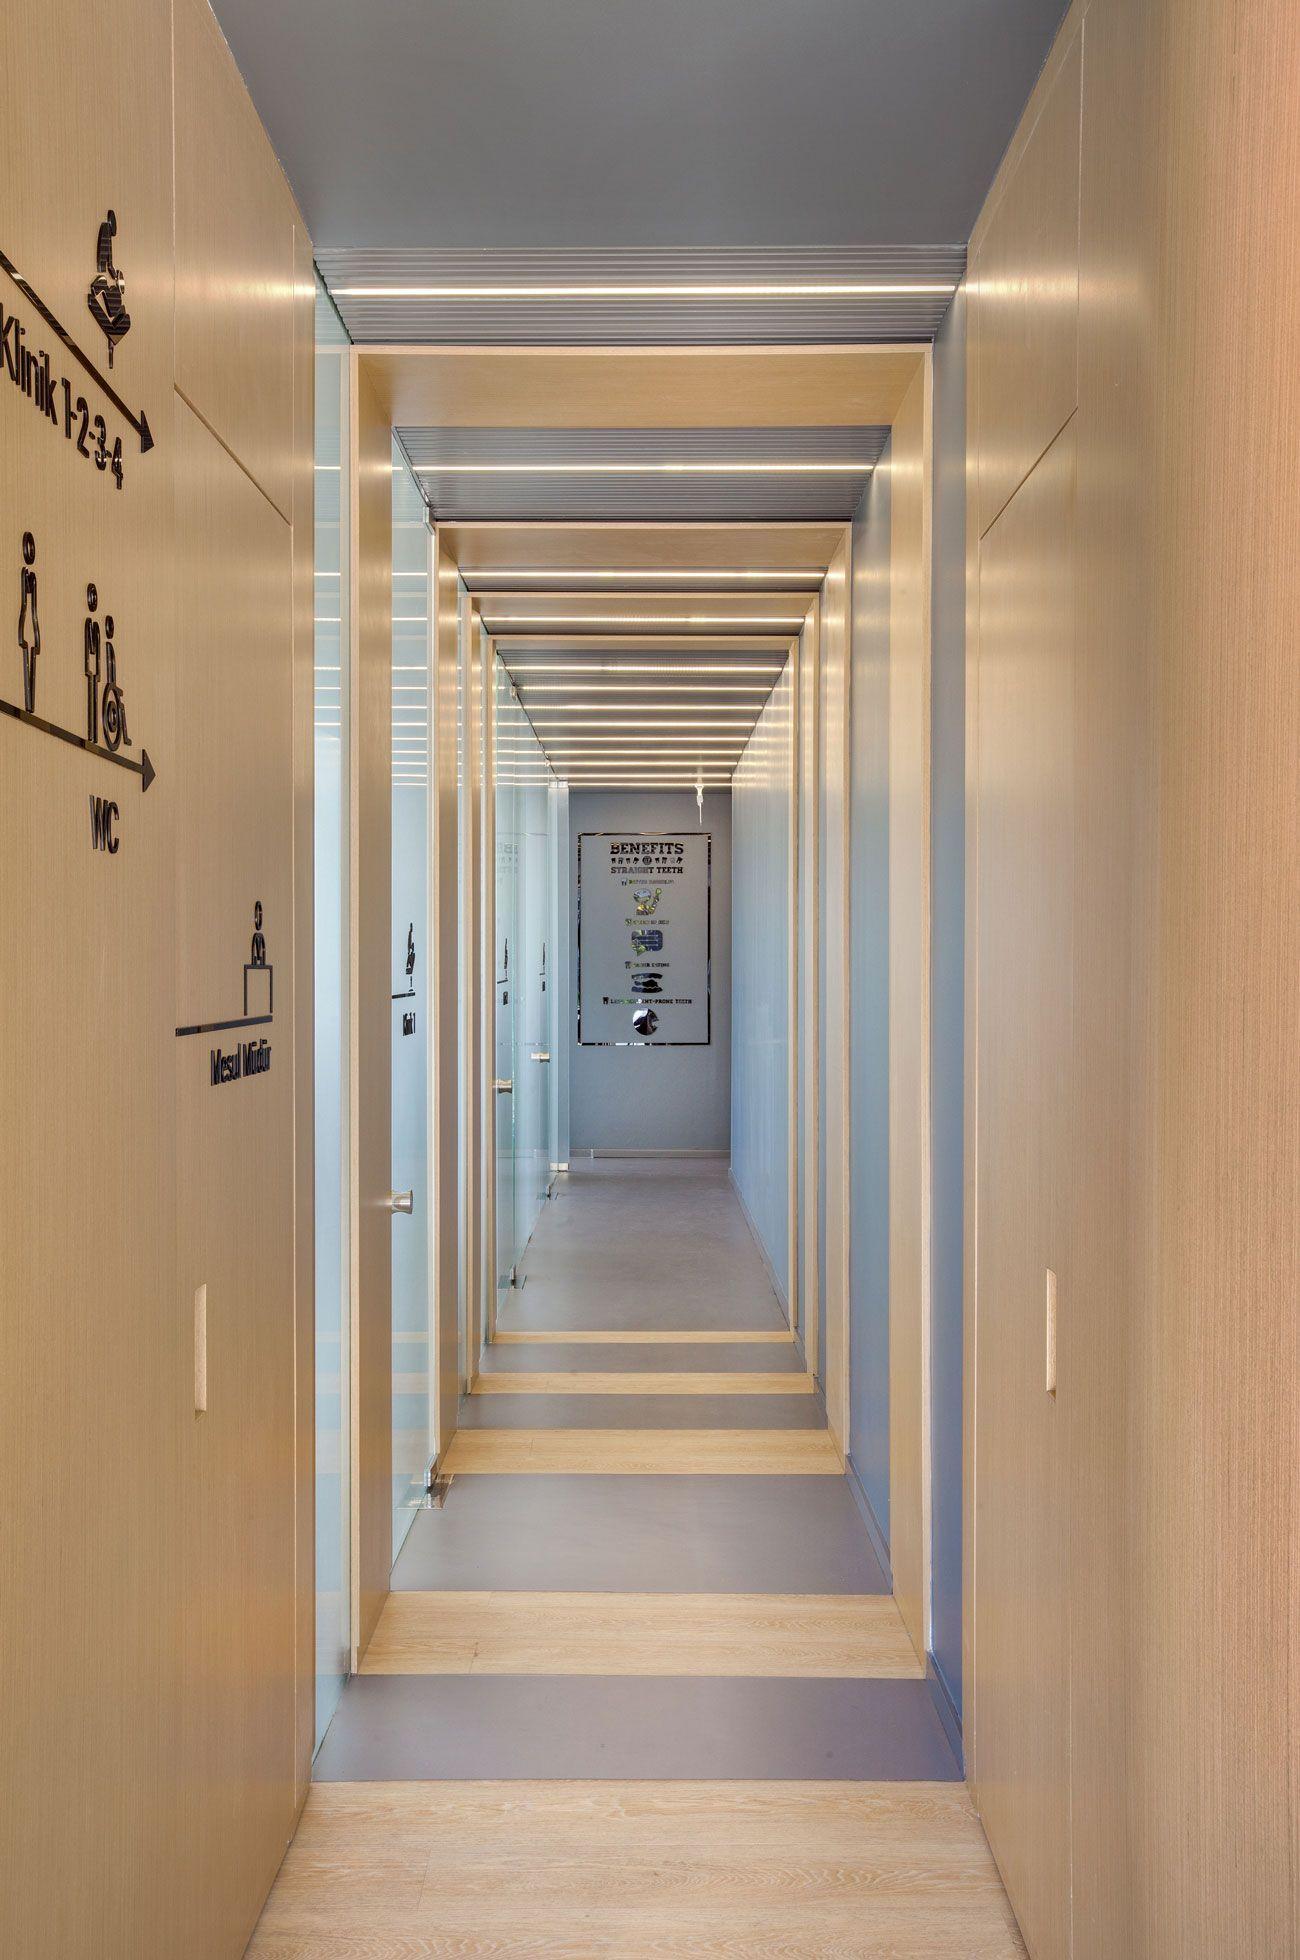 8 Dazzling Hallway Lighting Ideas That Ll Impress You Momo Zain Hallway Lighting Small Hallways Narrow Hallway Decorating